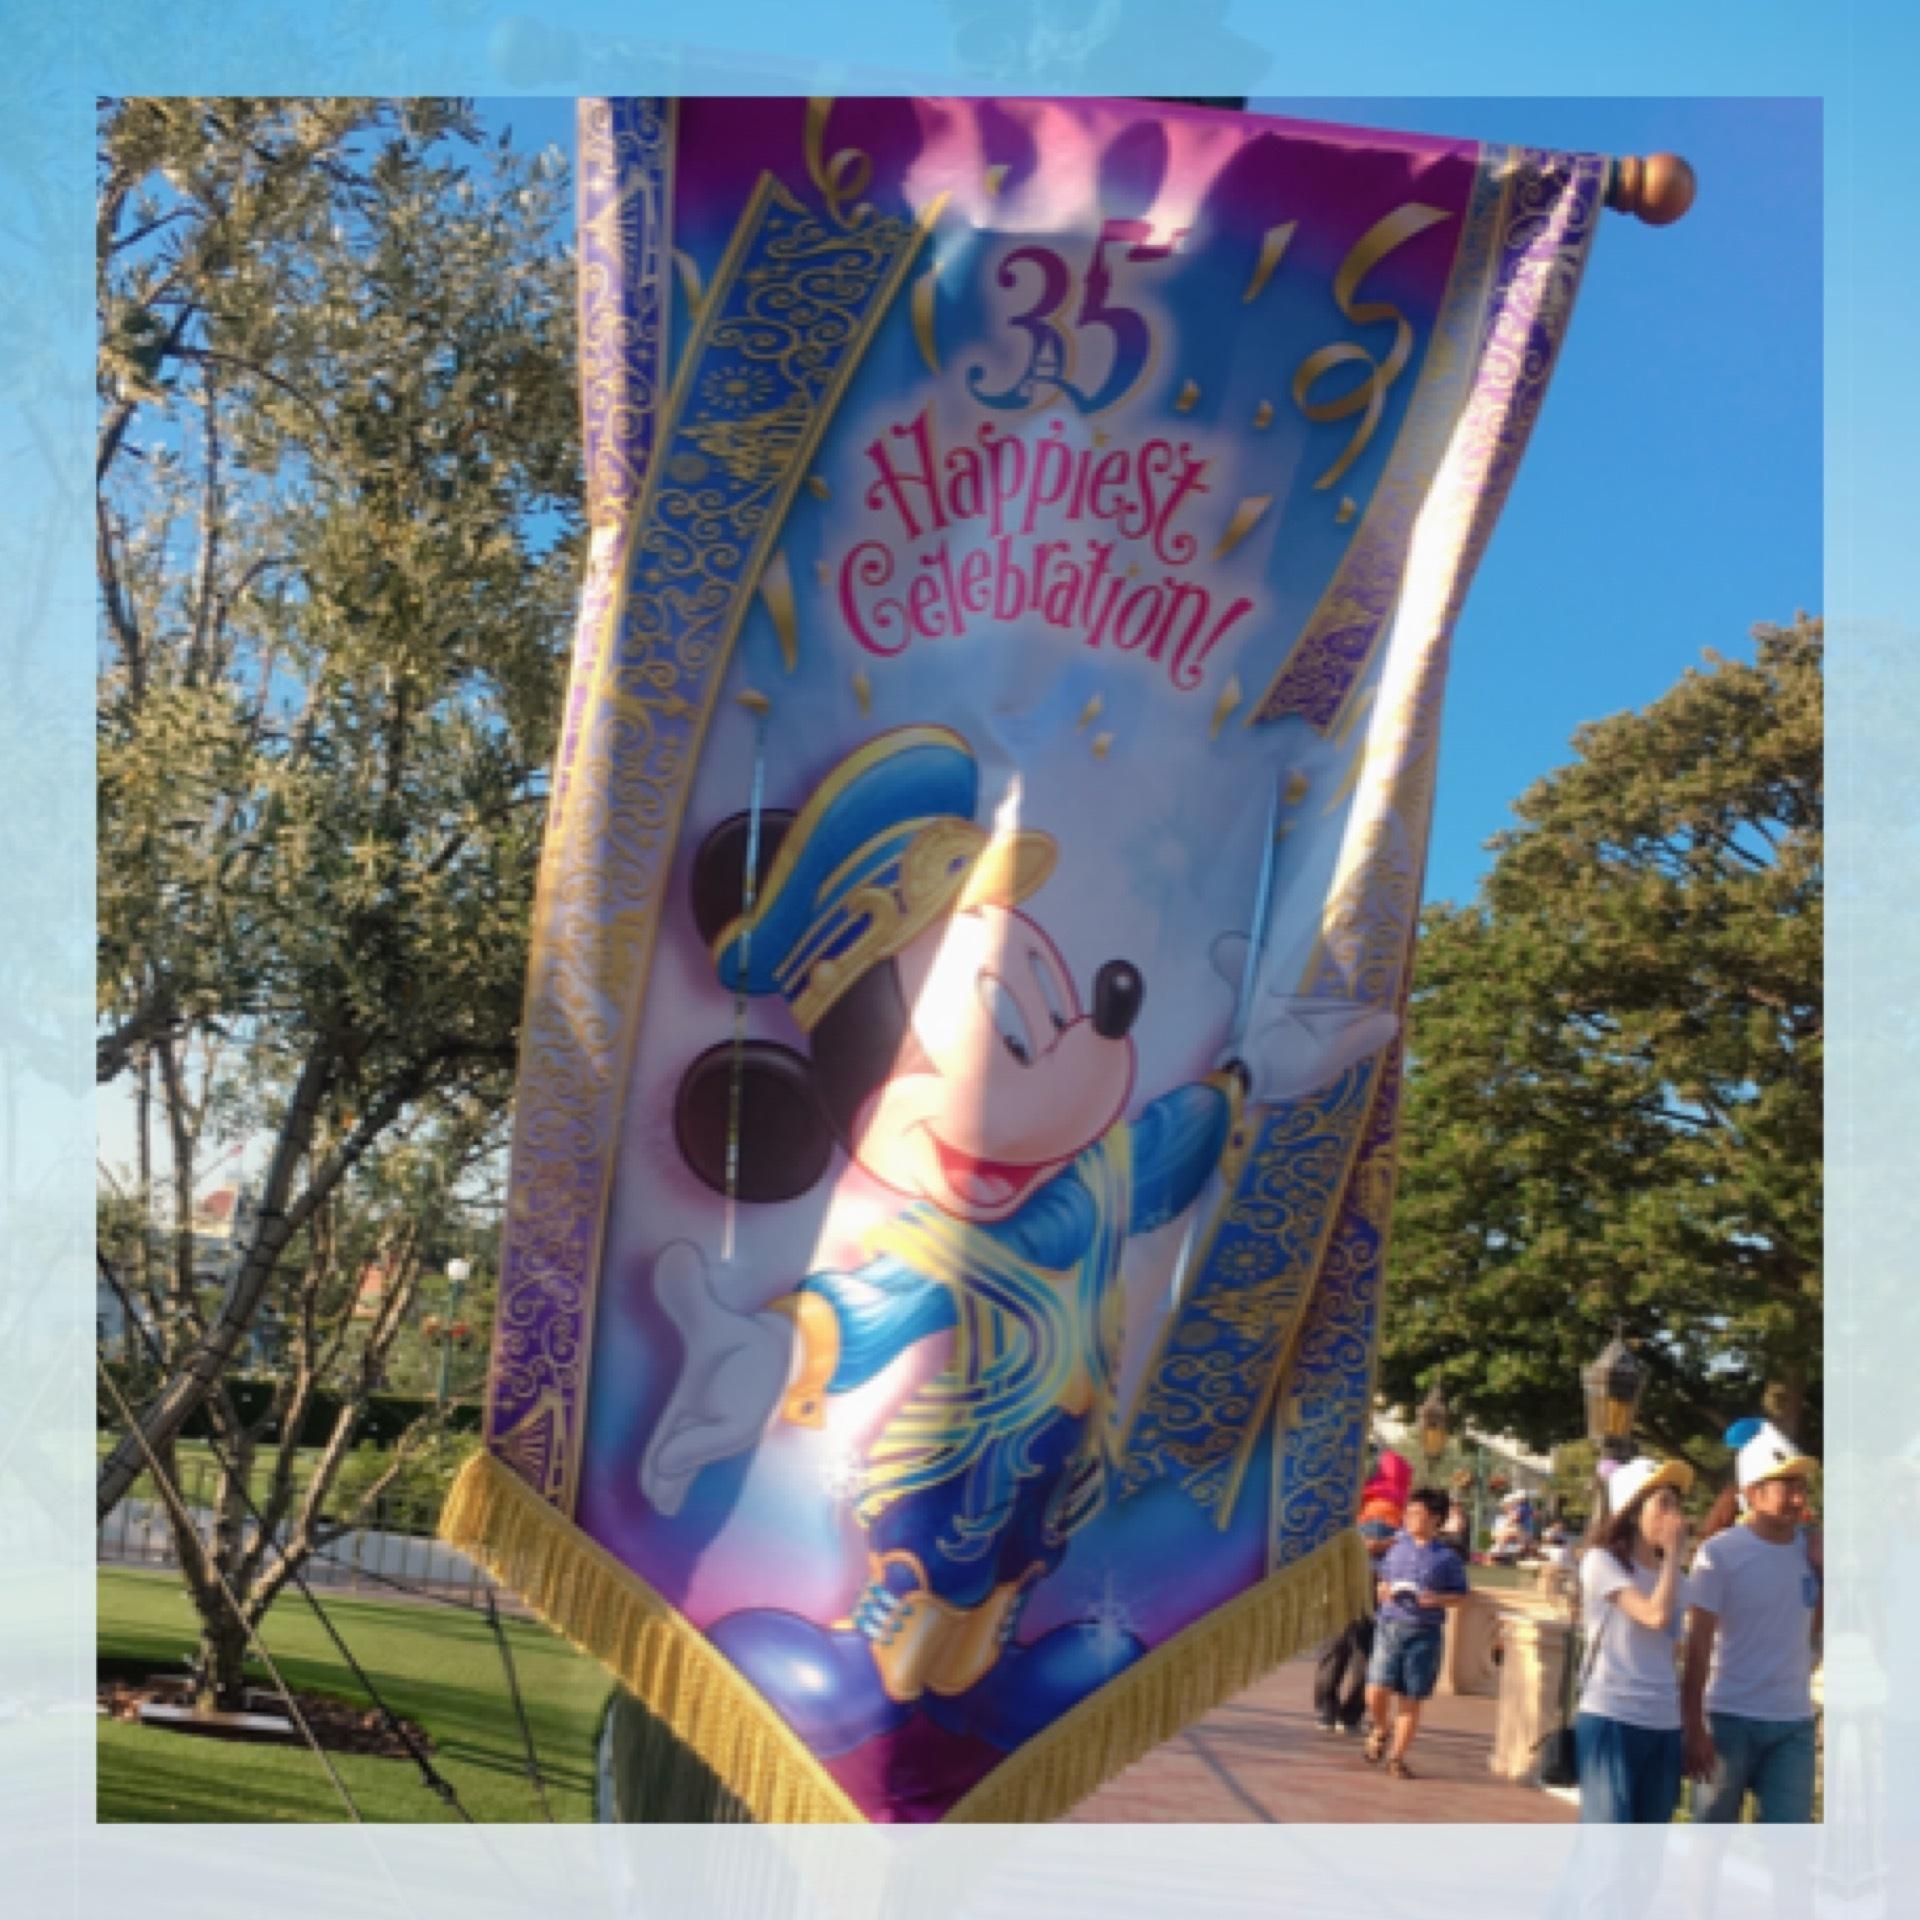 Tokyo Disneyland《 35 Happiest Gelebration! 》に行ってきました♫_1_5-2